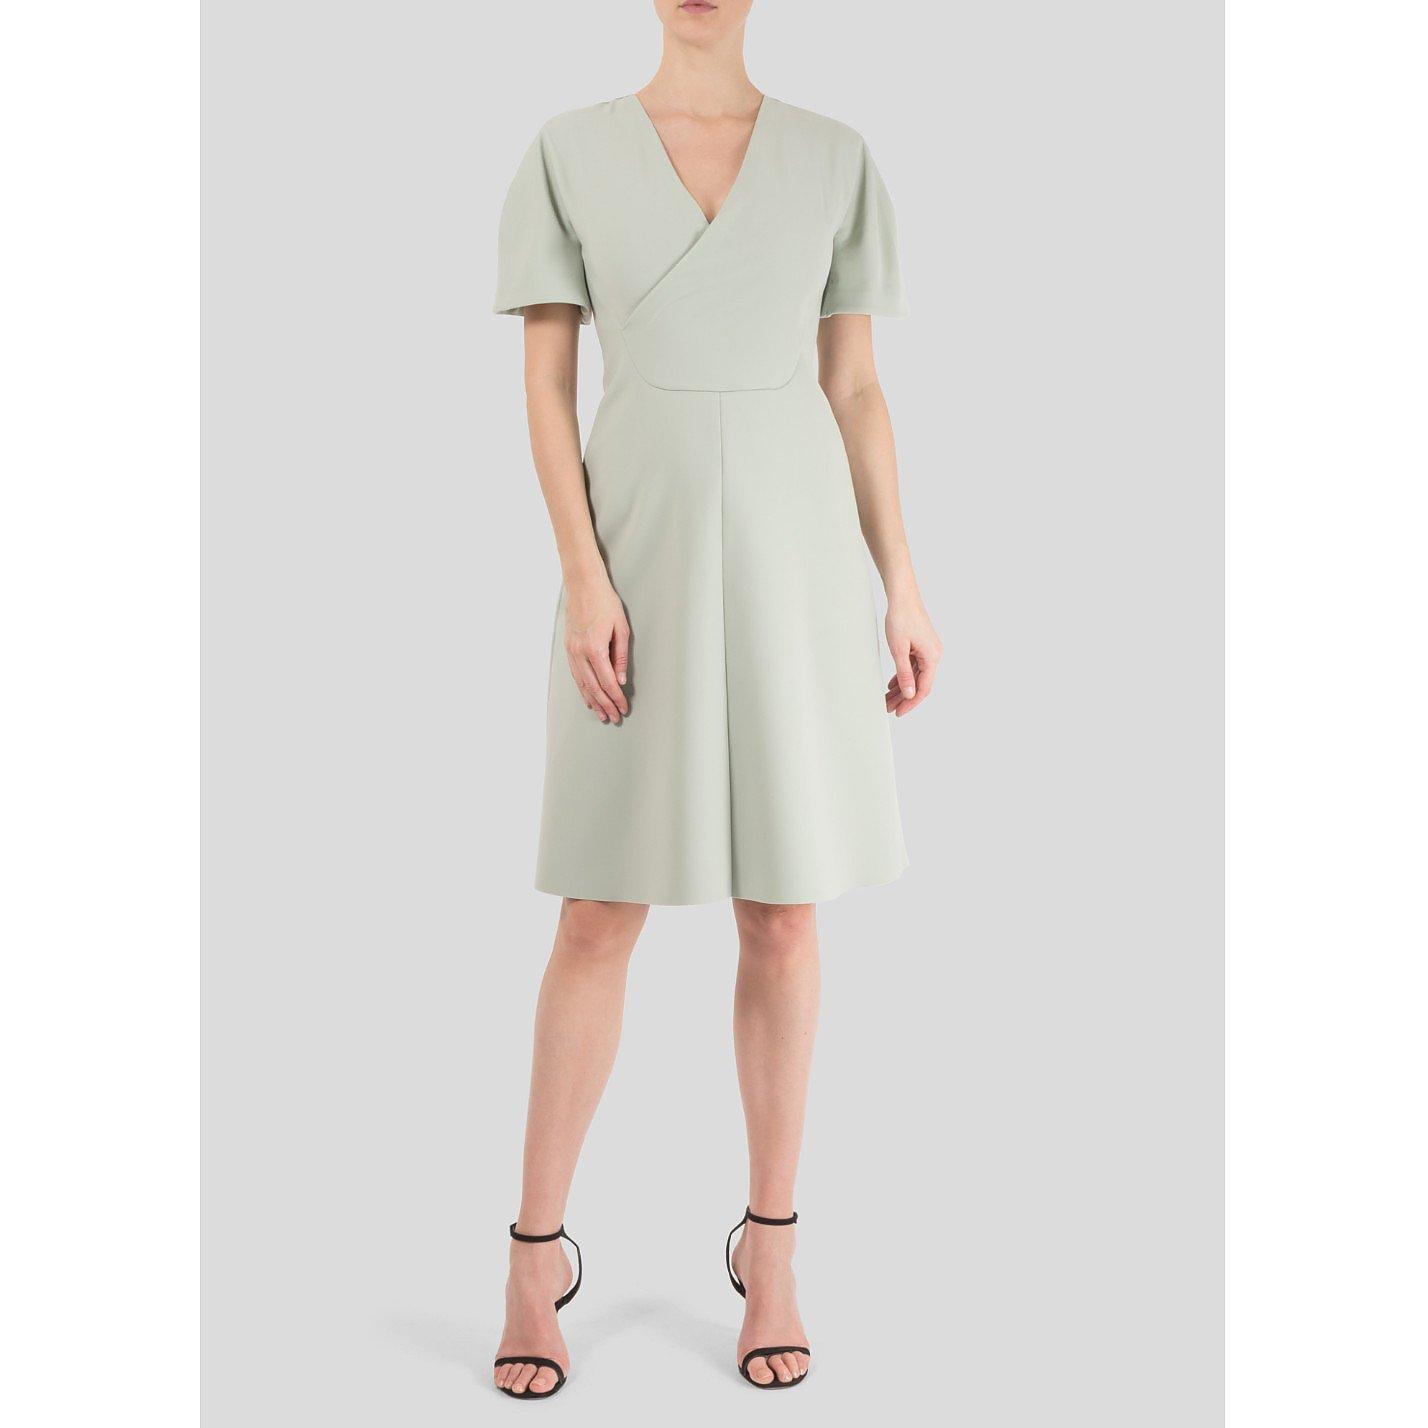 Balenciaga Short Sleeve Dress